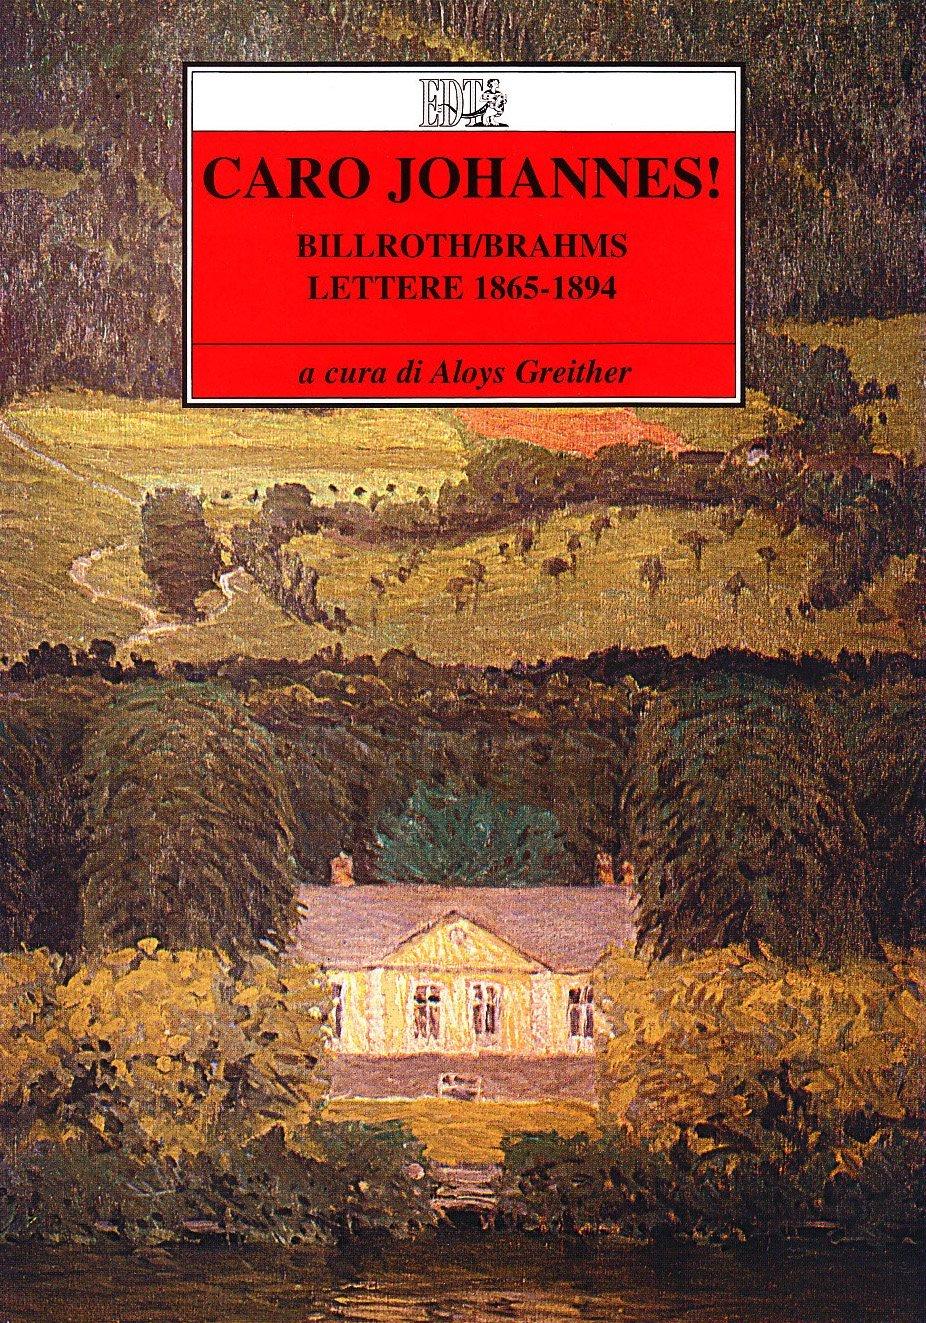 Caro Johannes! Billroth-Brahms: lettere 1865-1895  by  Johannes Brahms